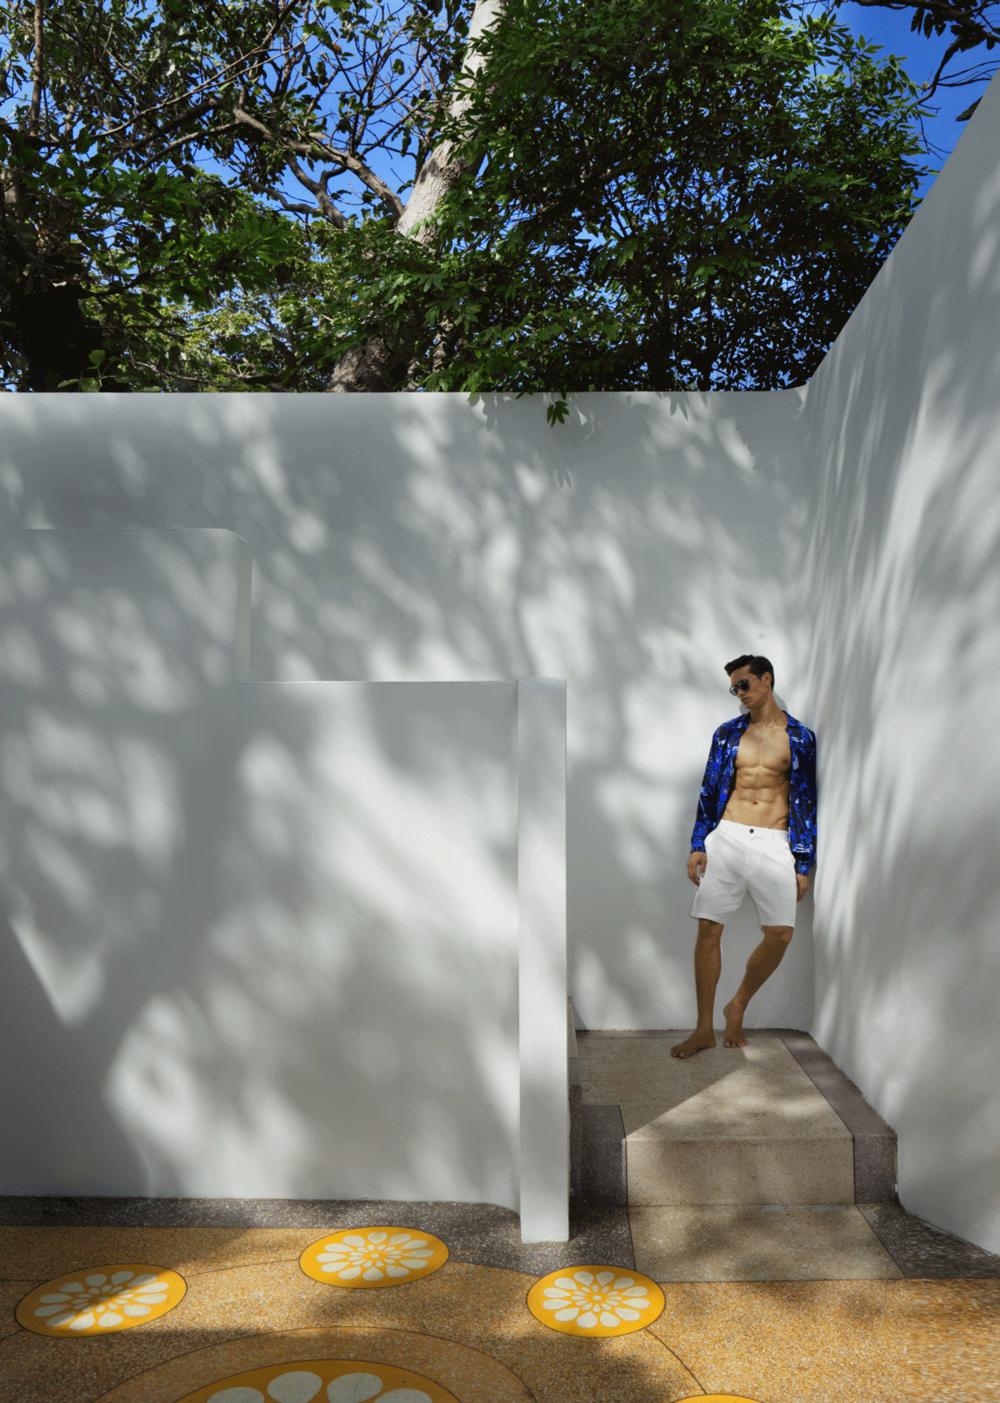 shirt : Emilio Pucci / shorts : A/X Armani Exchange / sunglasses : Emporio Armani